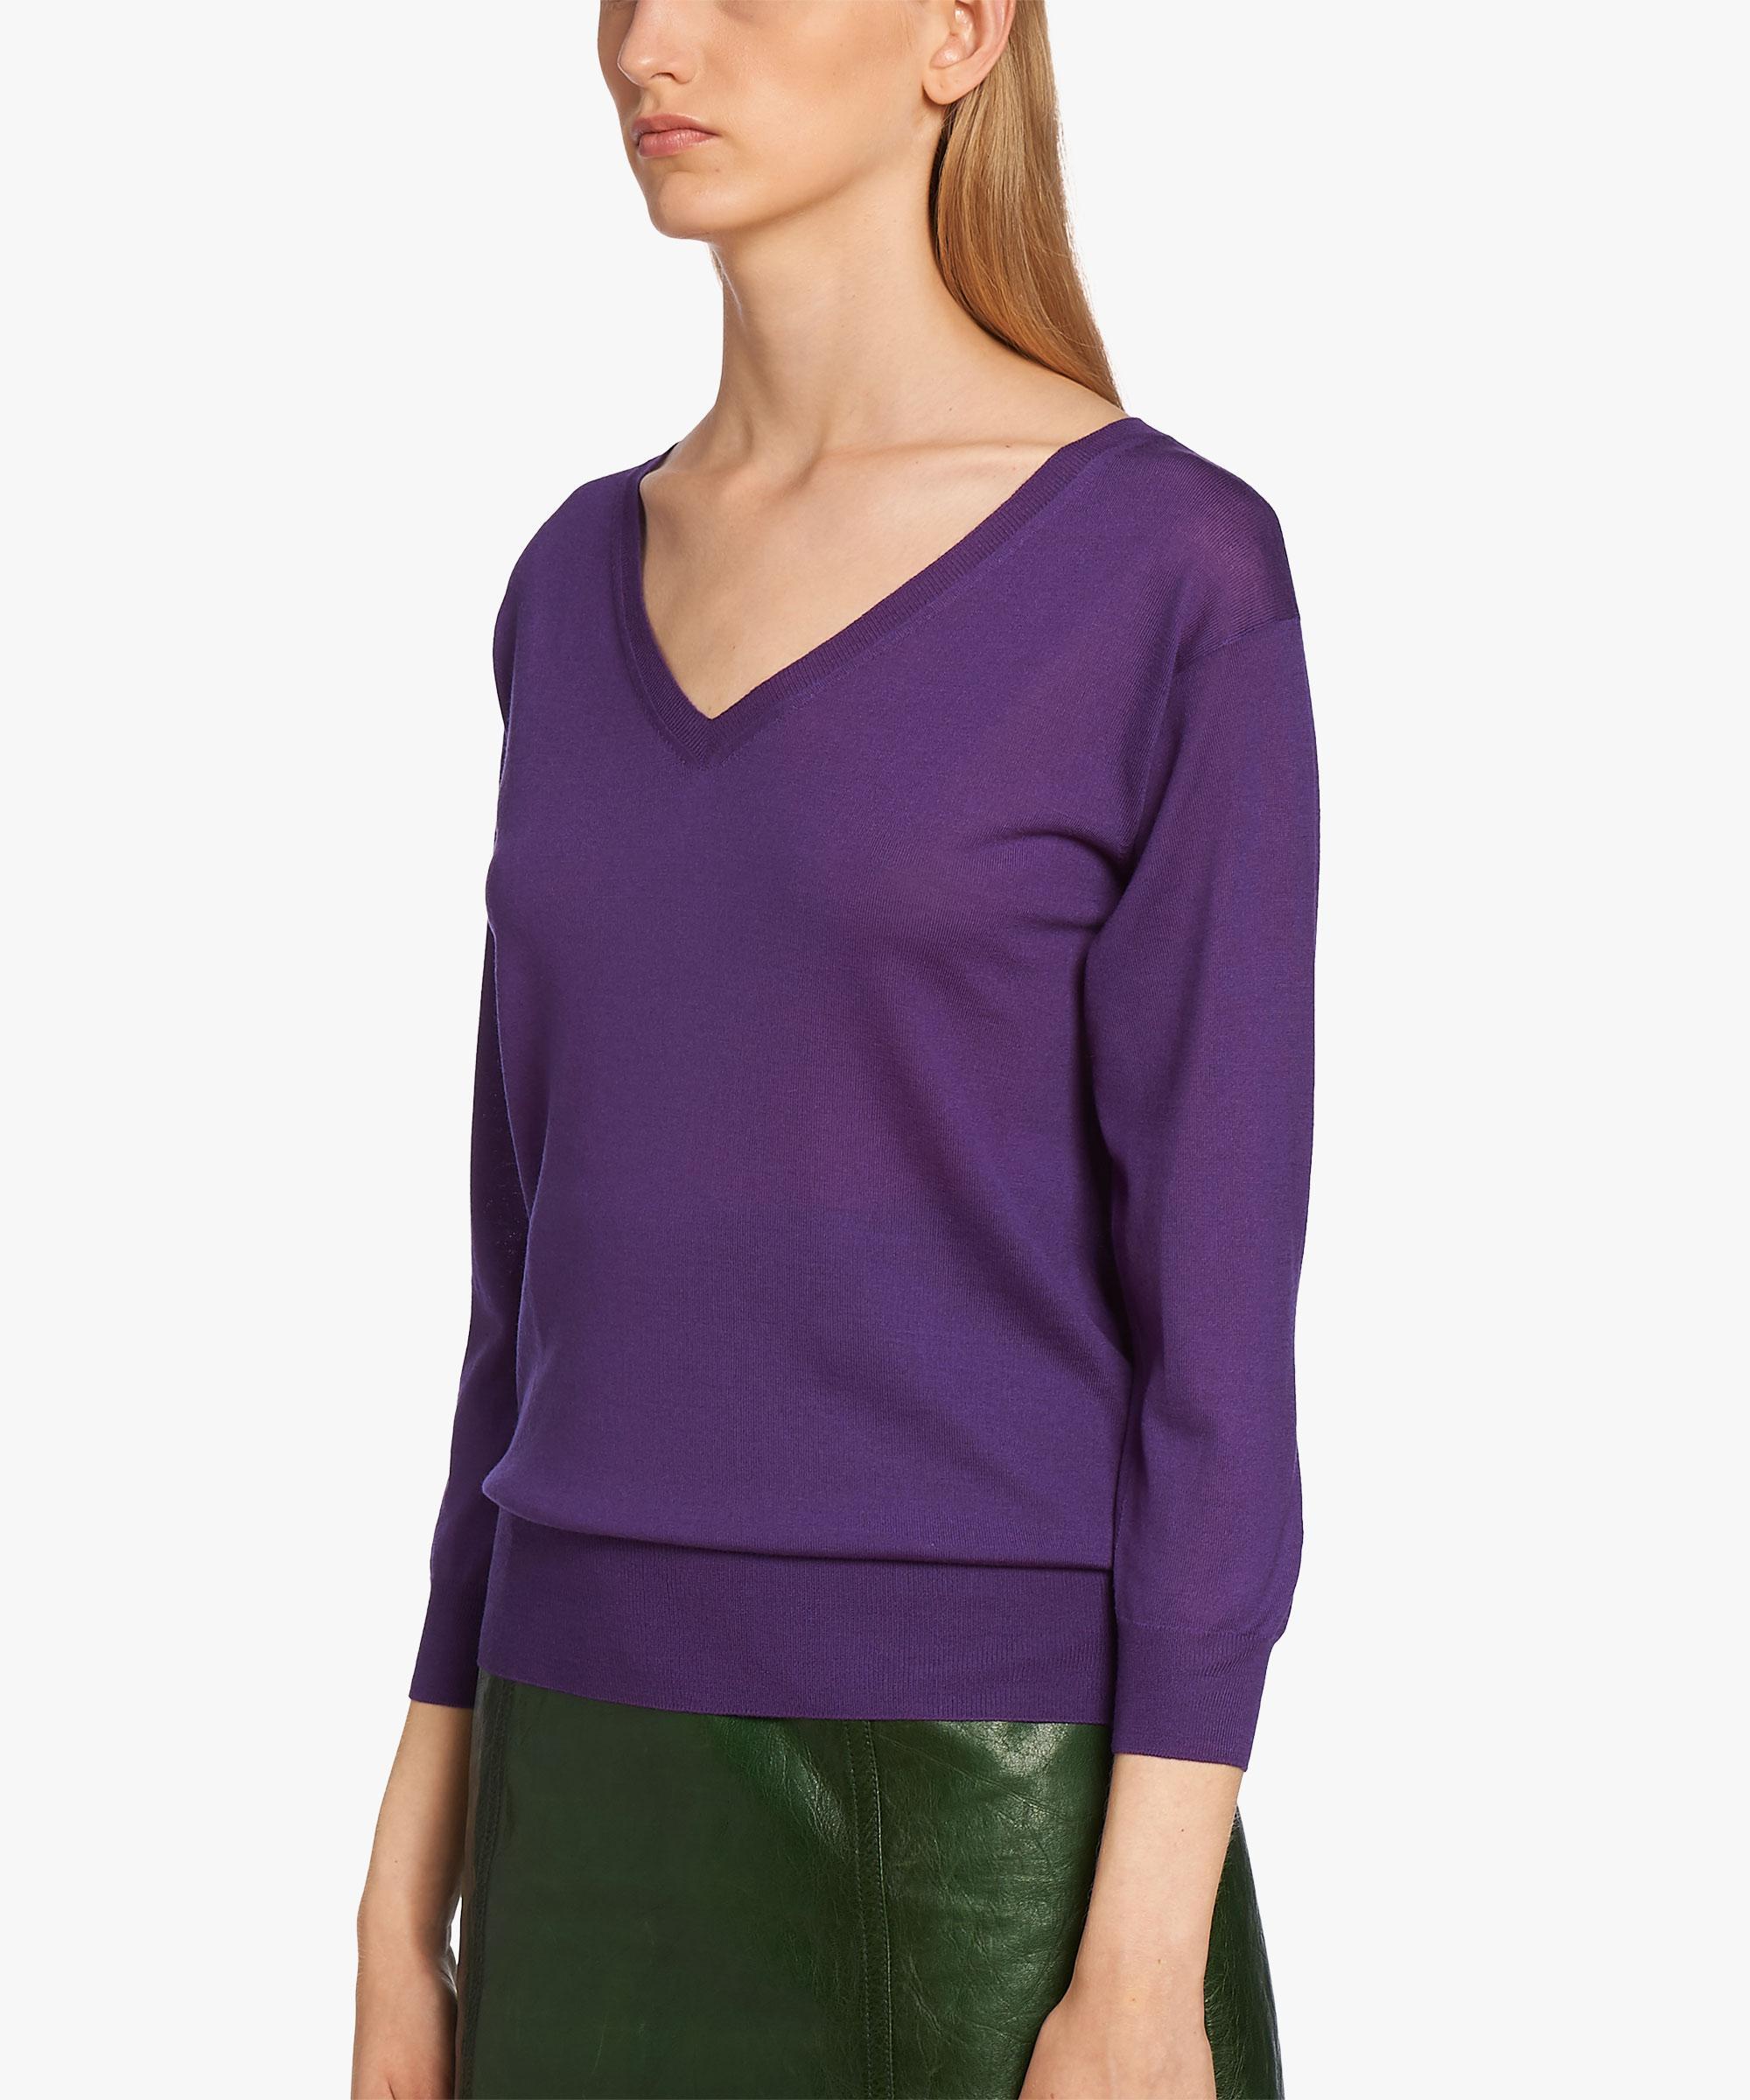 Prada Merino Wool Sweater in Purple | Lyst